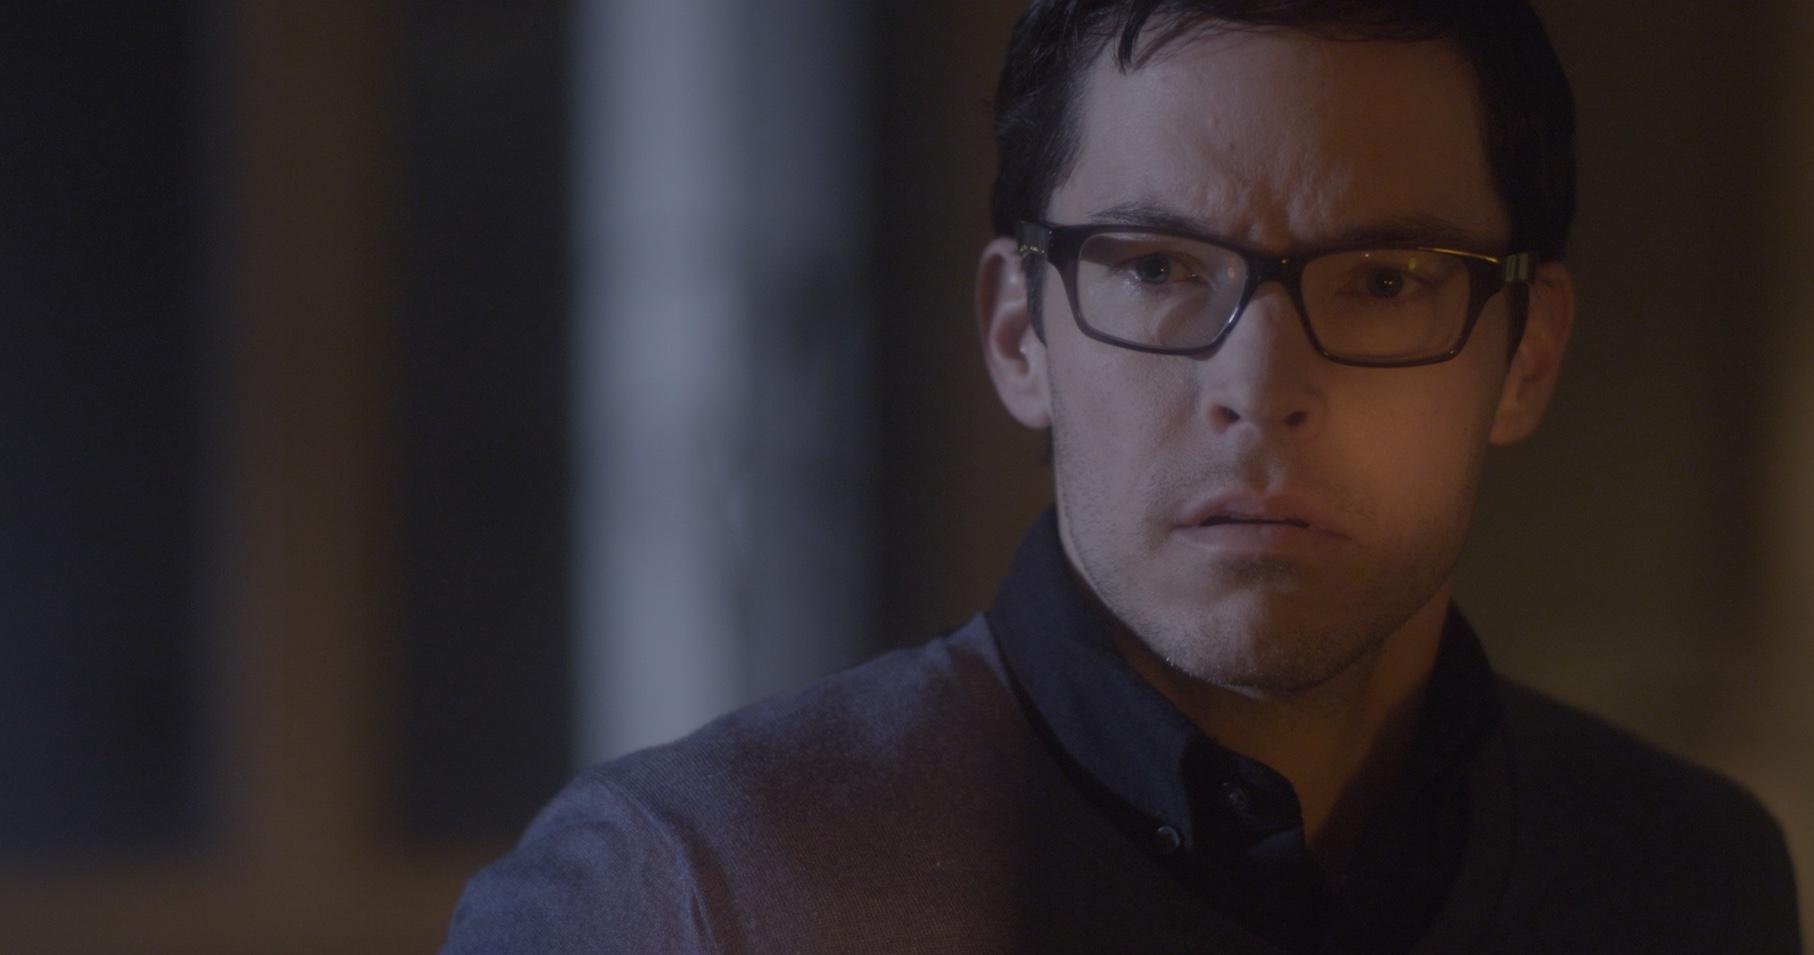 Screengrab from Miles